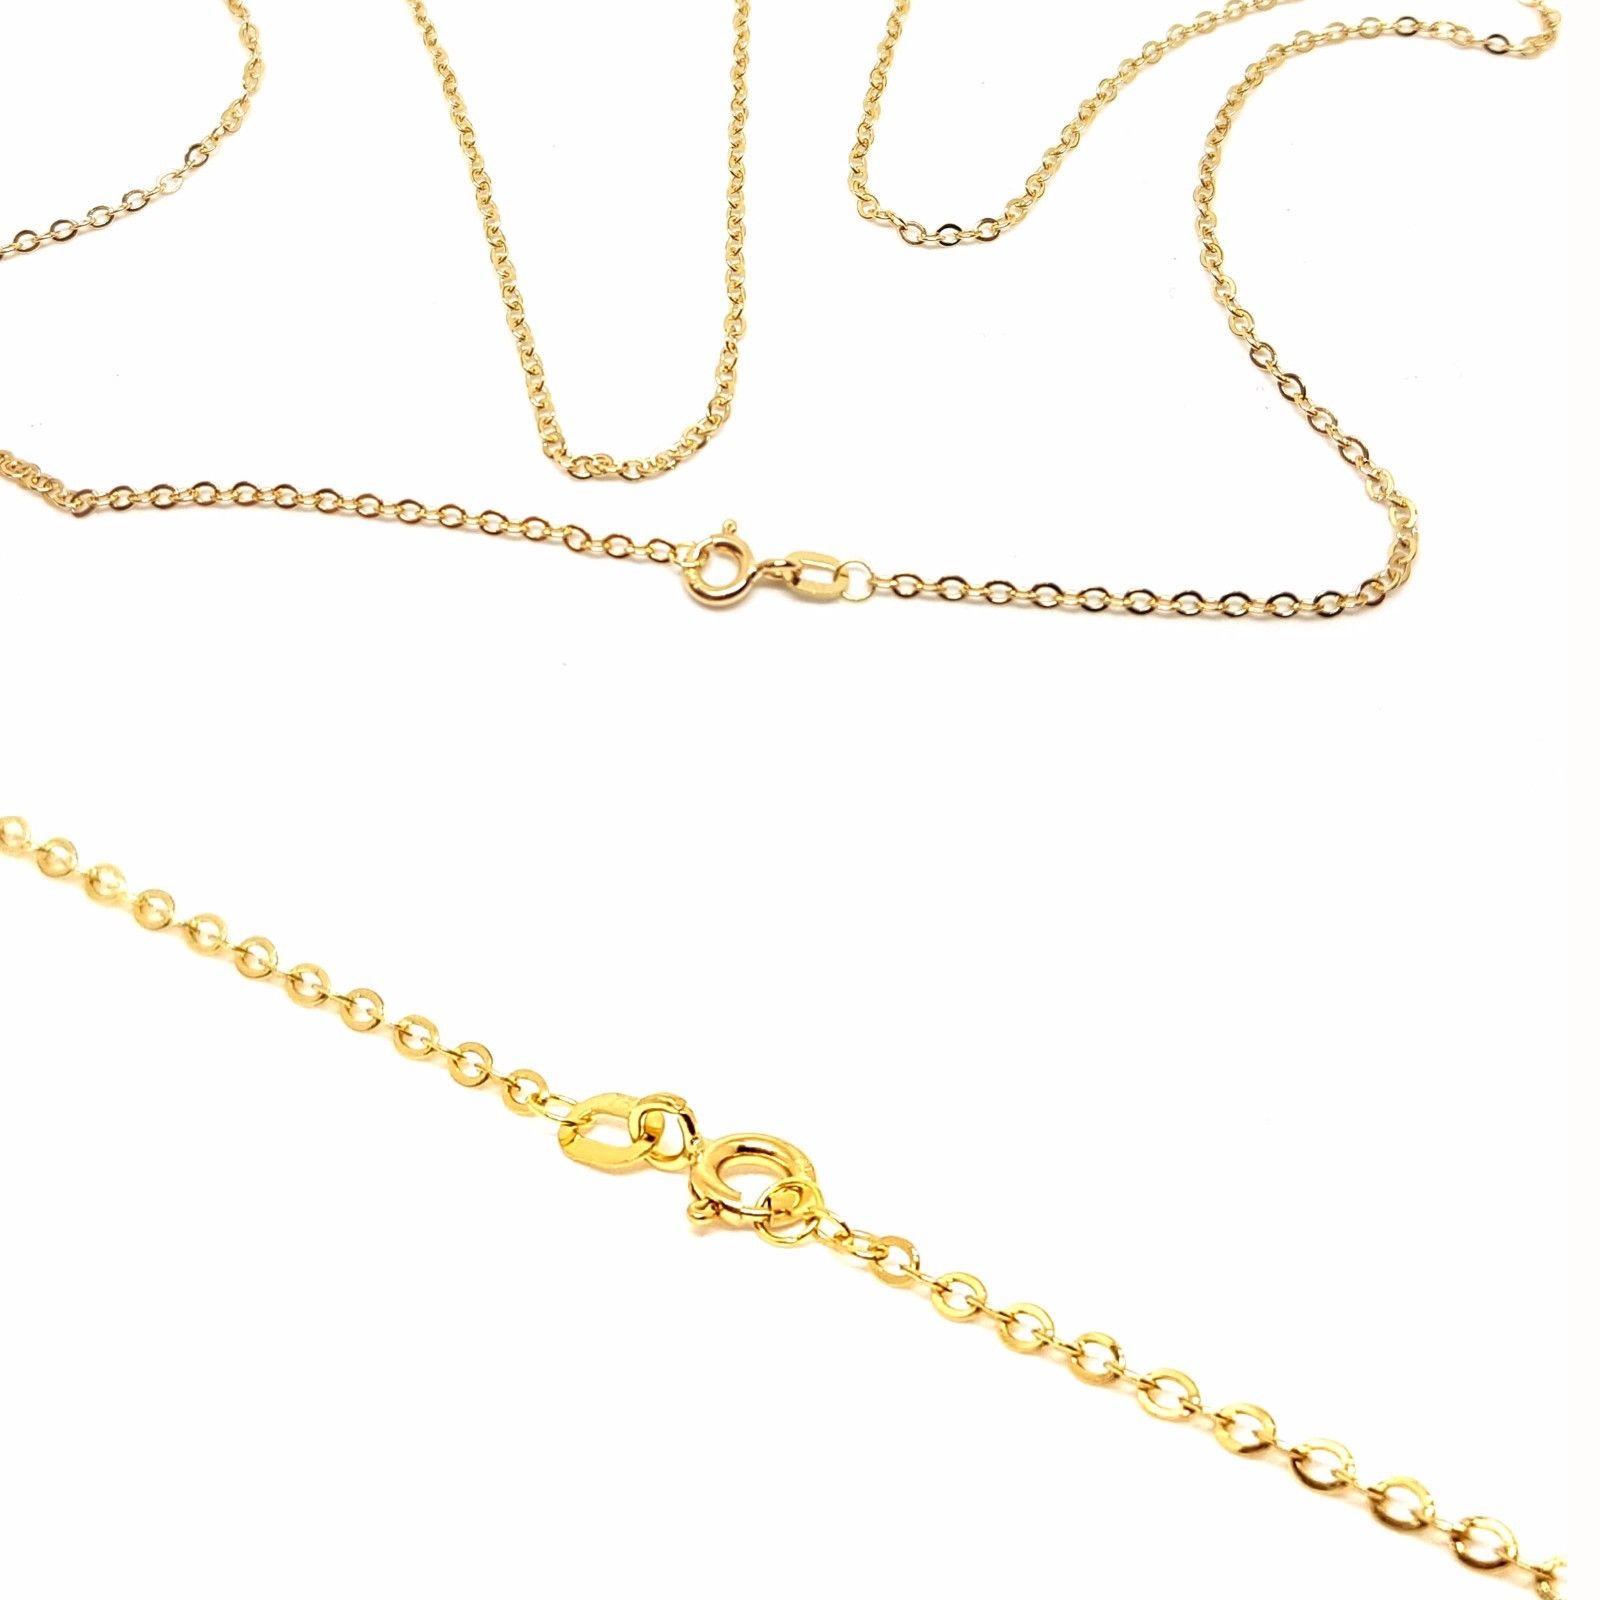 chaine forcat 2mm 60 cm or jaune 18k